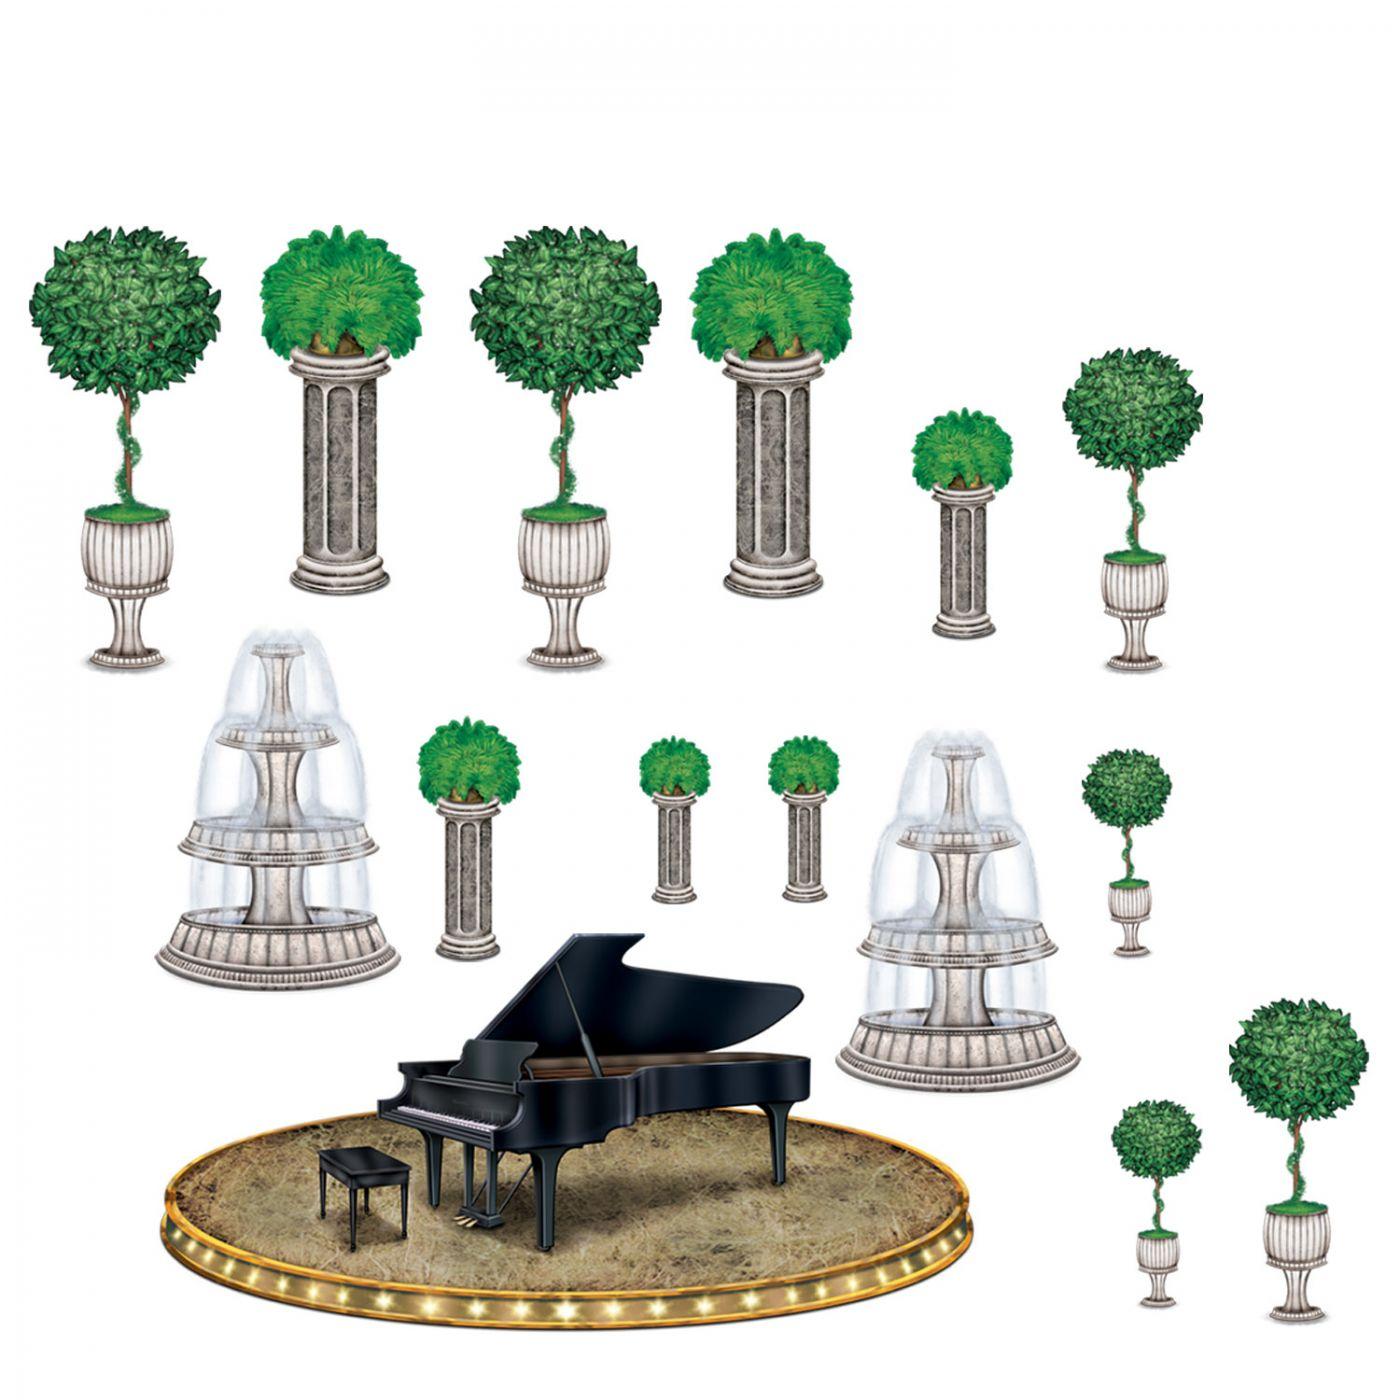 Image of Black-Tie Piano & Decor Props